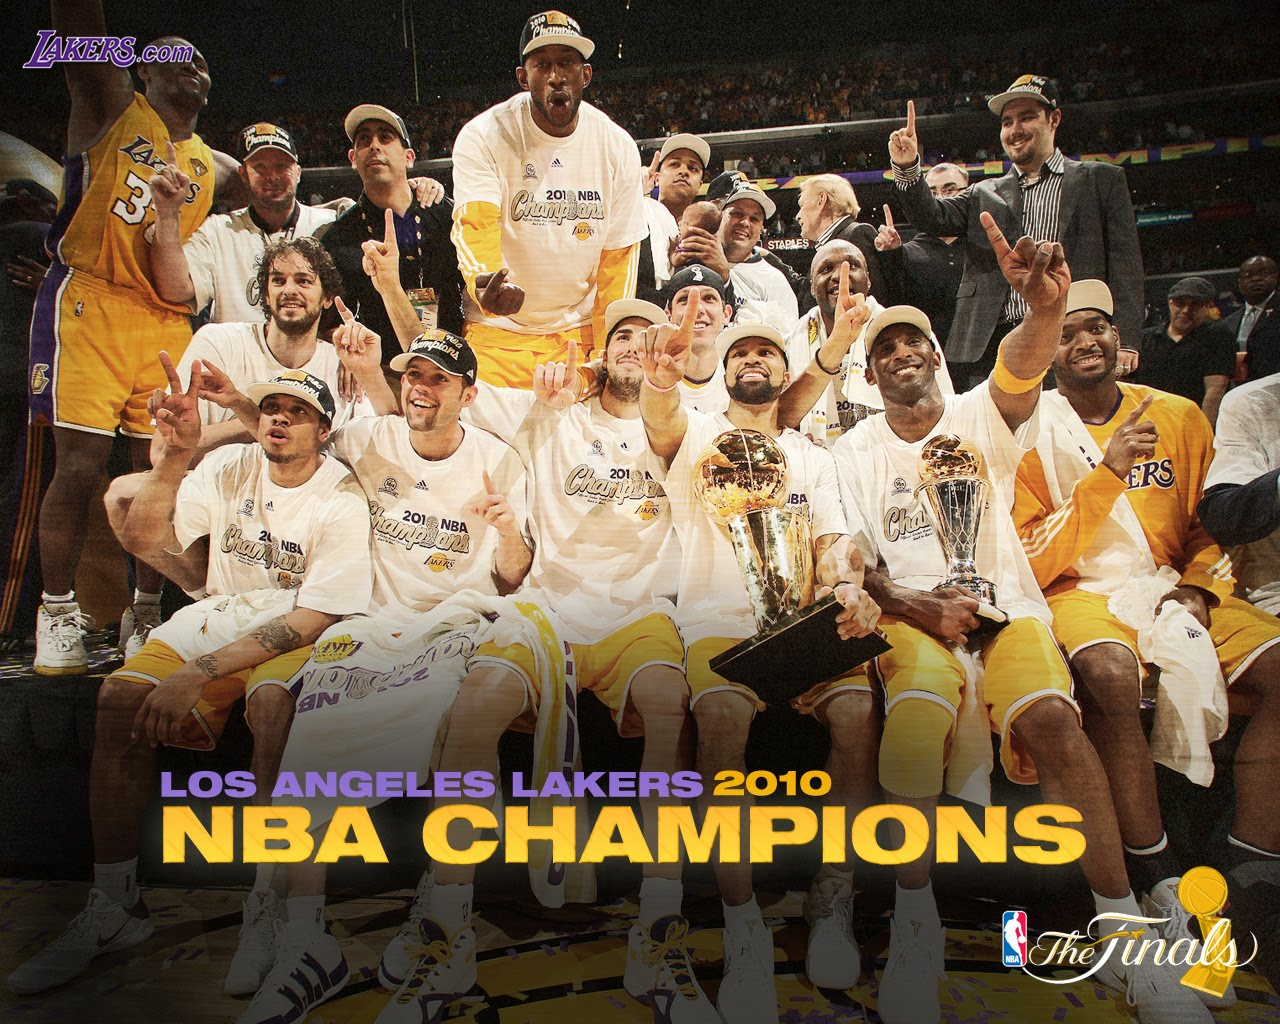 https://i0.wp.com/3.bp.blogspot.com/_1H9fbwR7liM/TMa-Wx2r2UI/AAAAAAAAA9E/Q2T4XSL0yHo/s1600/Lakers+2010+Champions+wallpaper.jpg?resize=567%2C455